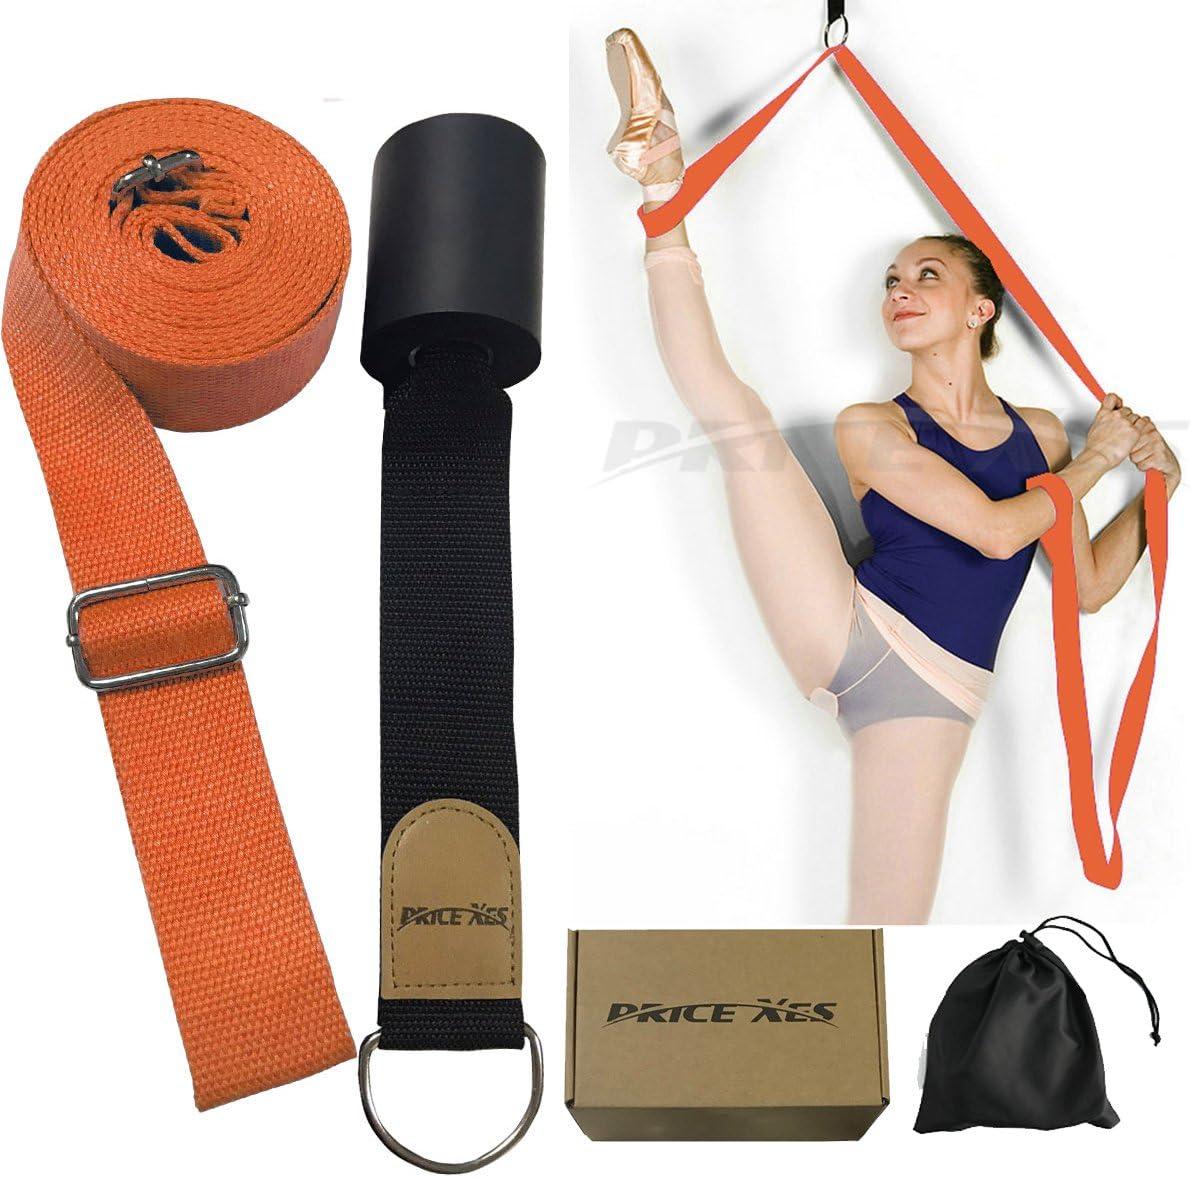 Great for Ballet Cheer Dance Gymnastics or Any Sport Leg Stretcher Door Flexibility Trainer Premium Stretching Equipment Price Xes Door Flexibility /& Stretching Leg Strap